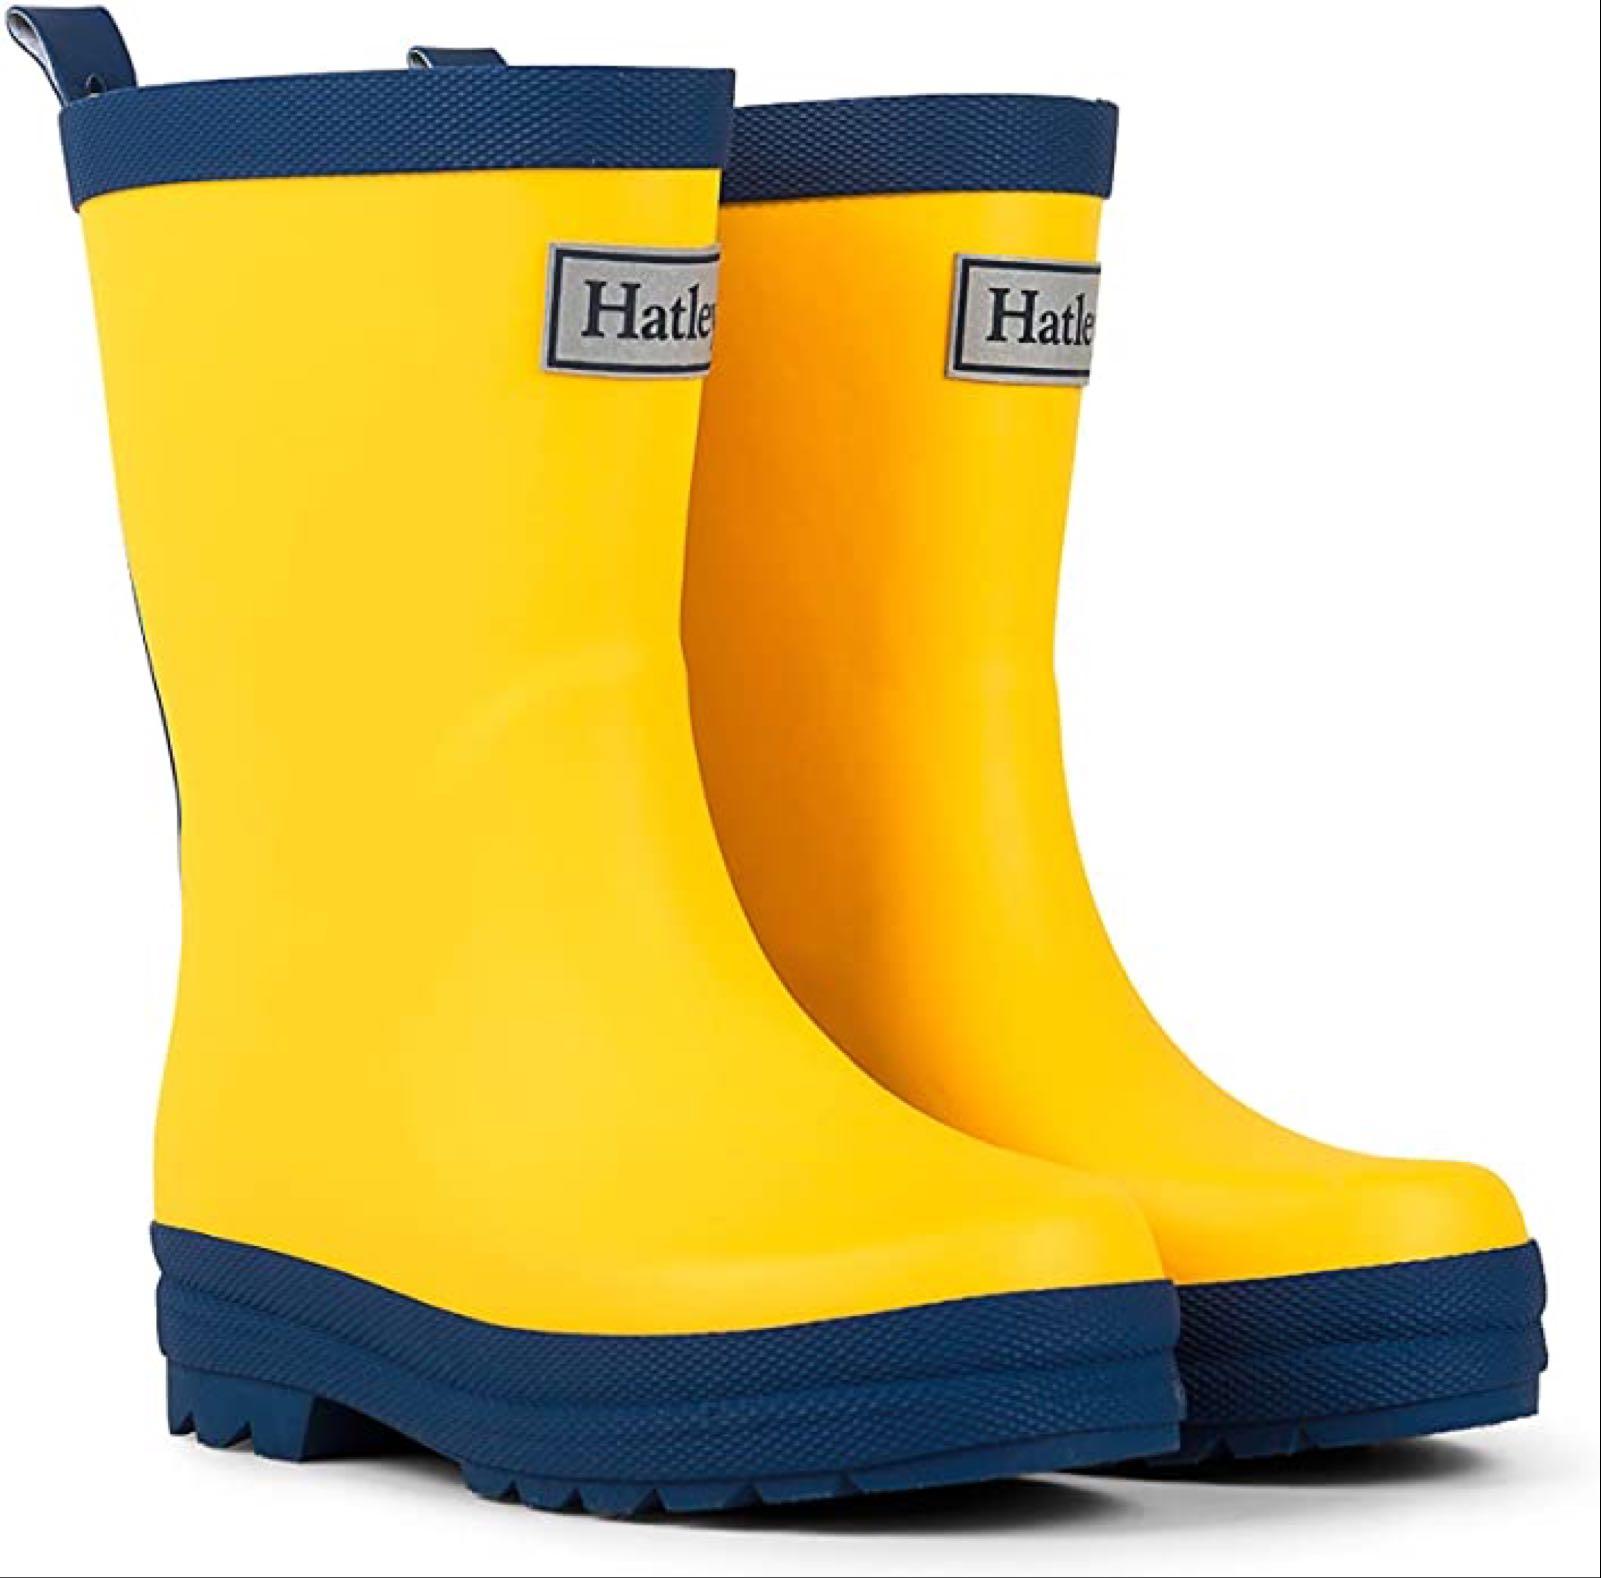 HATLEY Rain Boots Yellow RB0YELLOW345